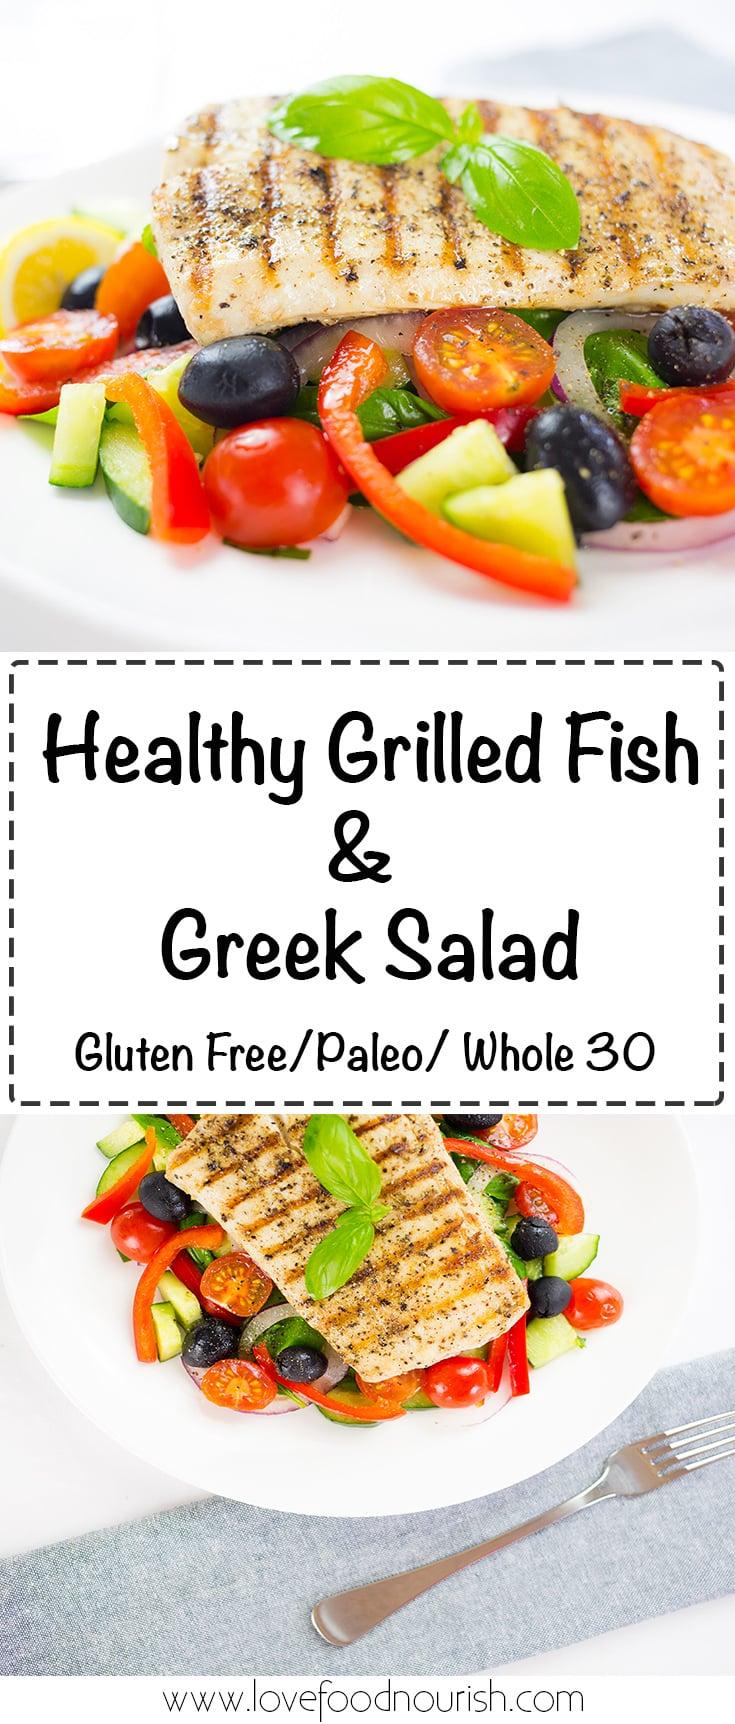 Healthy Fish Salad with grilled fish and a tasty greek salad. #fishsalad #greeksalad #paleo #whole30 #glutenfree #healthydinner